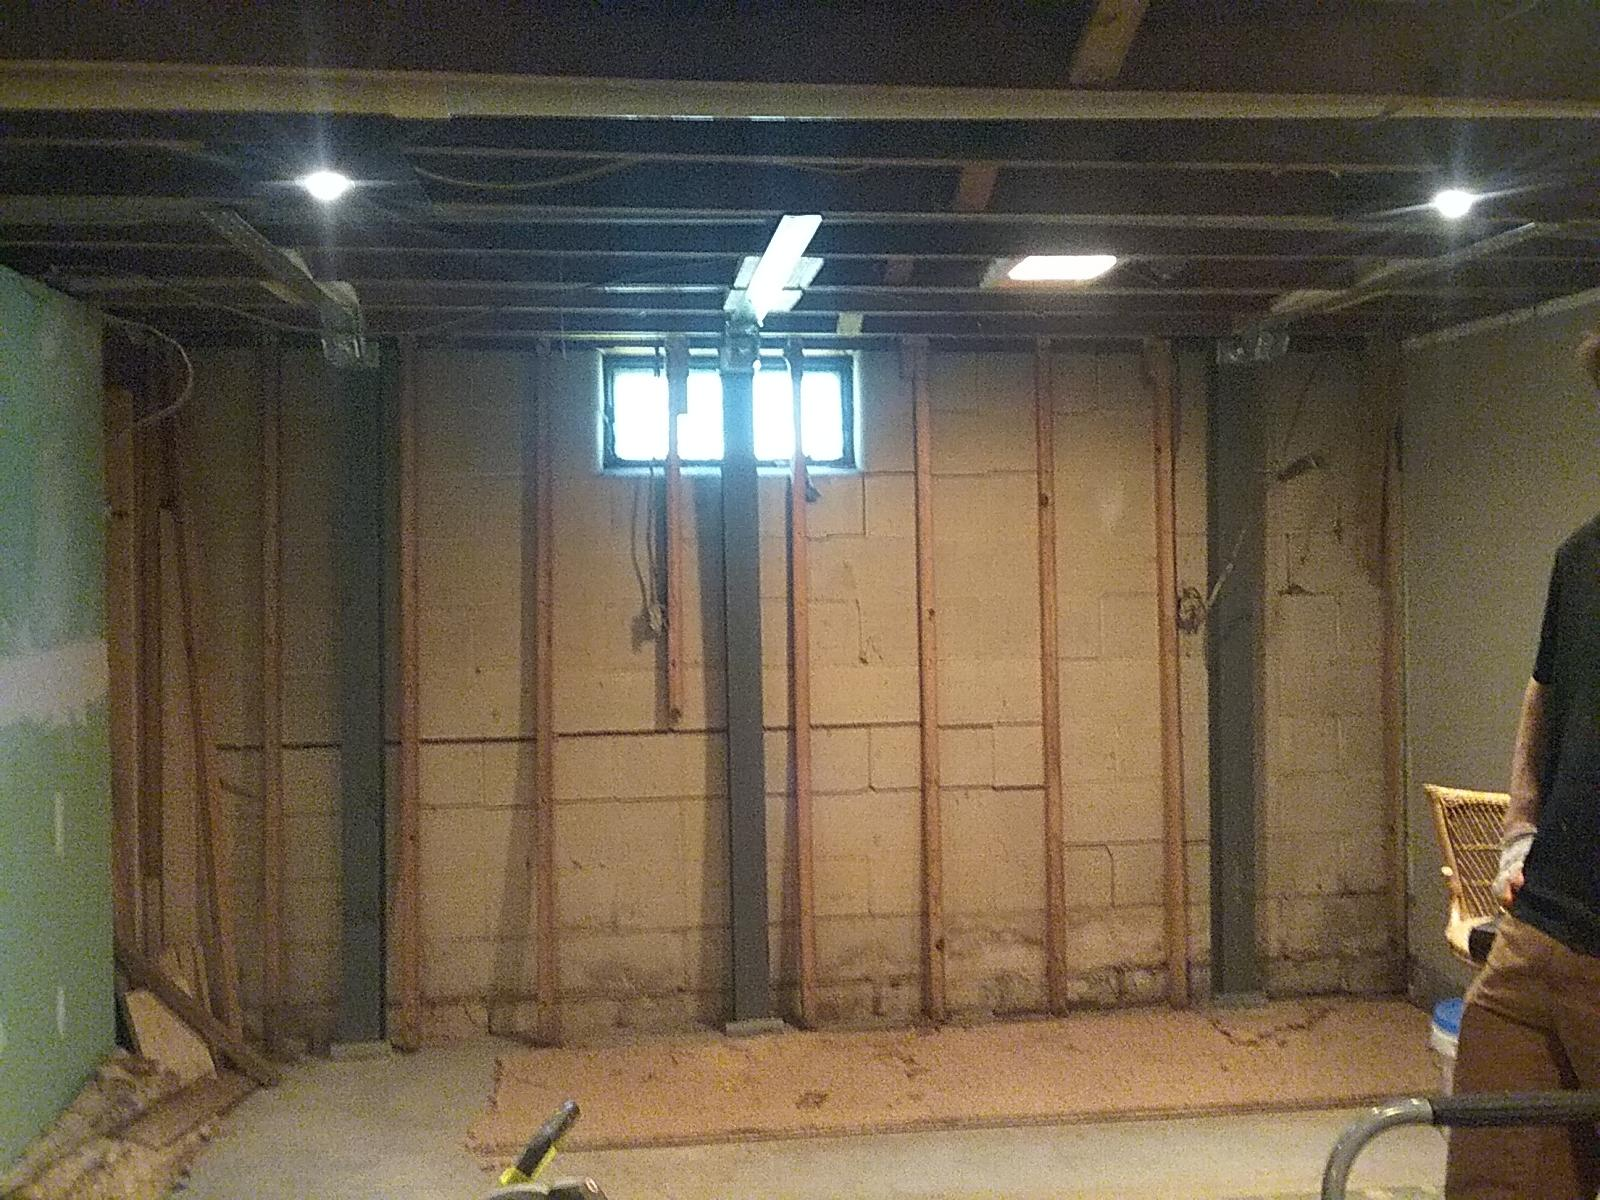 PowerBrace Wall Stabilization in Zanesville, OH - After Photo